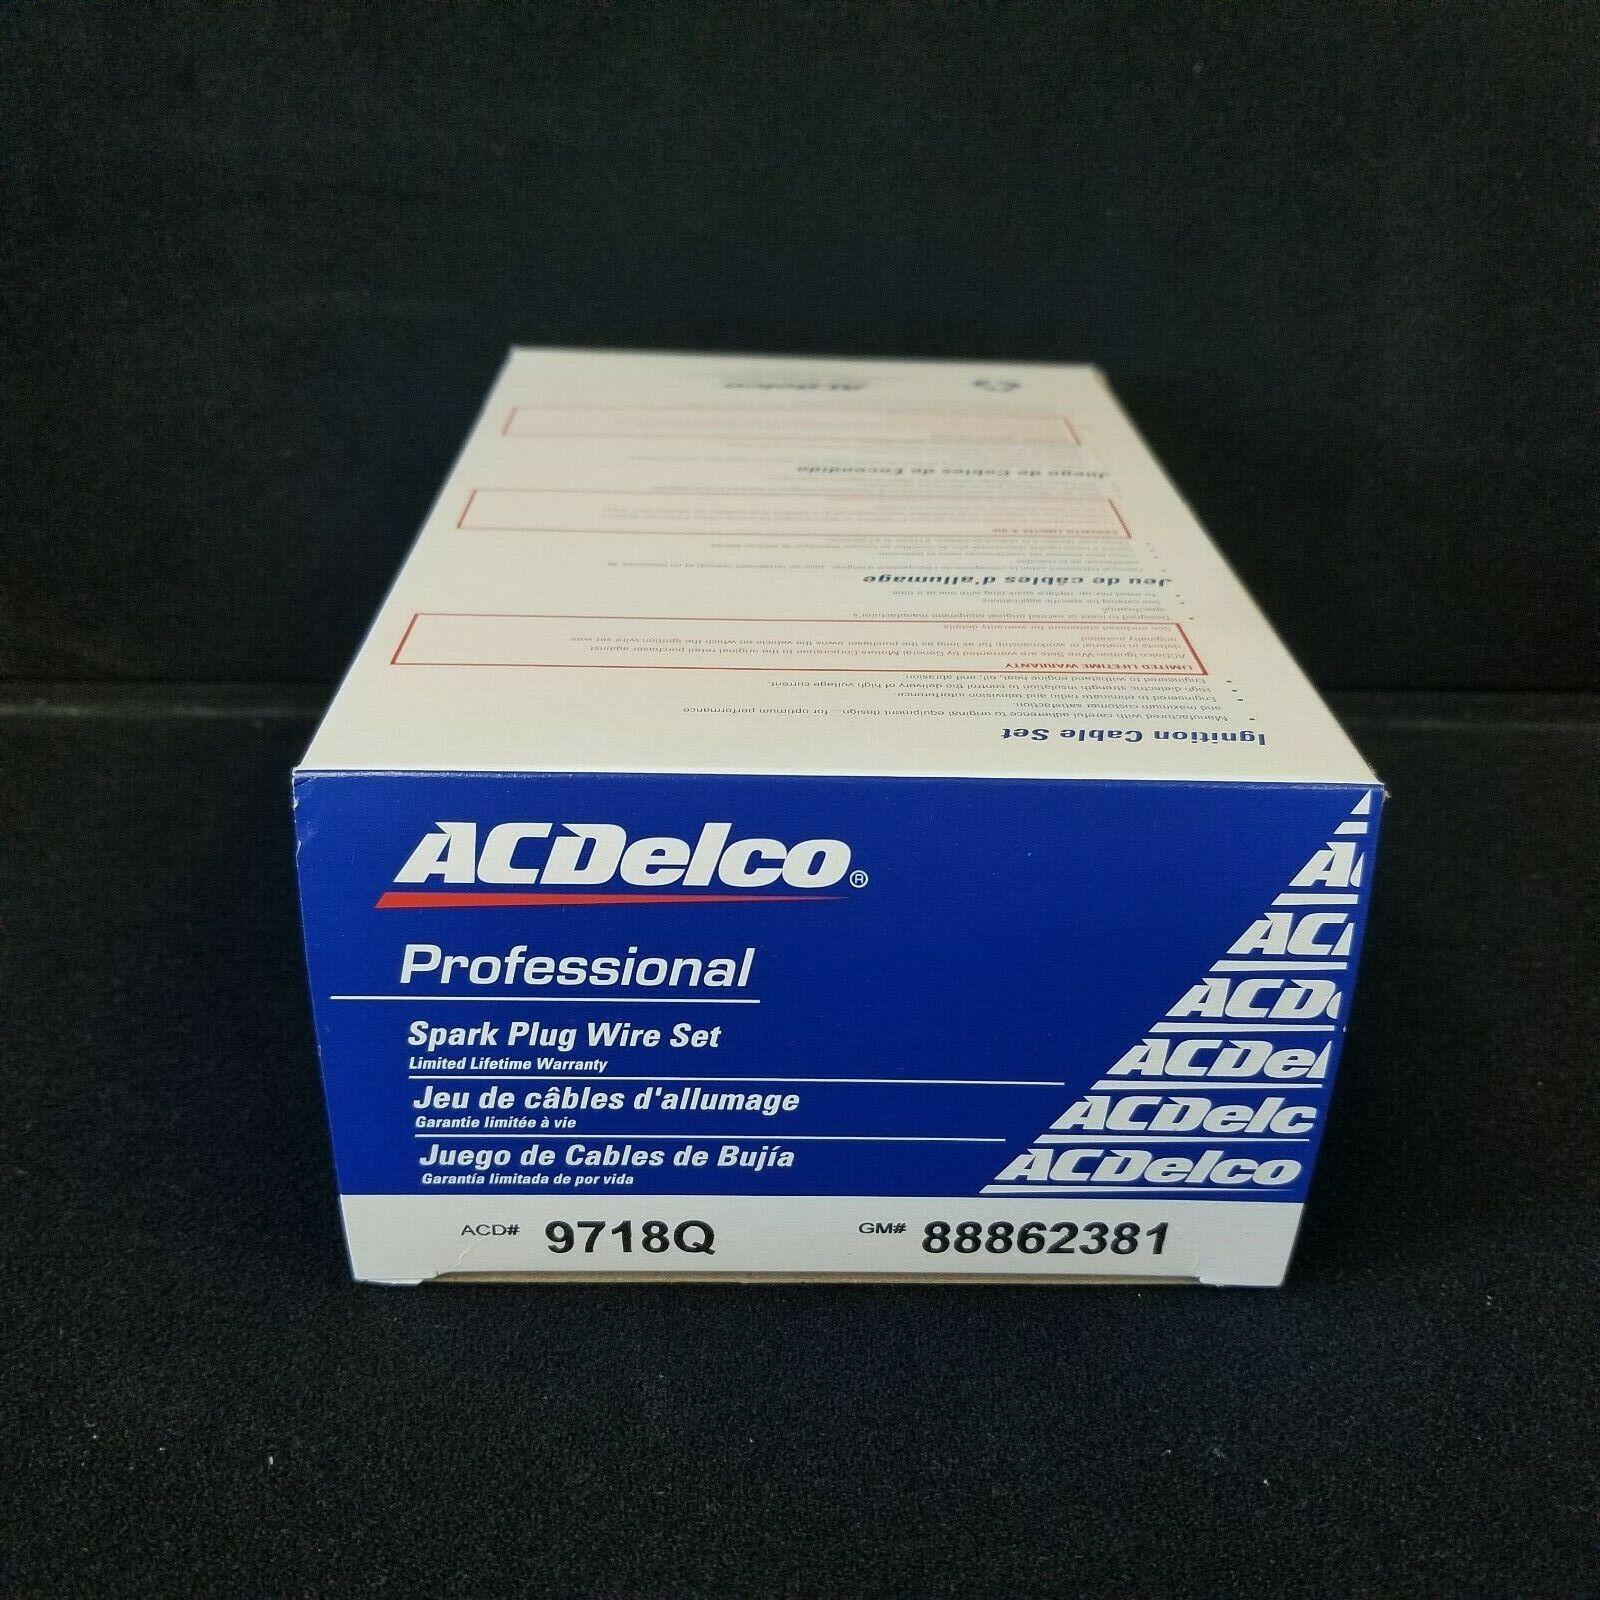 Spark Plug Wire Set ACDelco Pro 9718Q